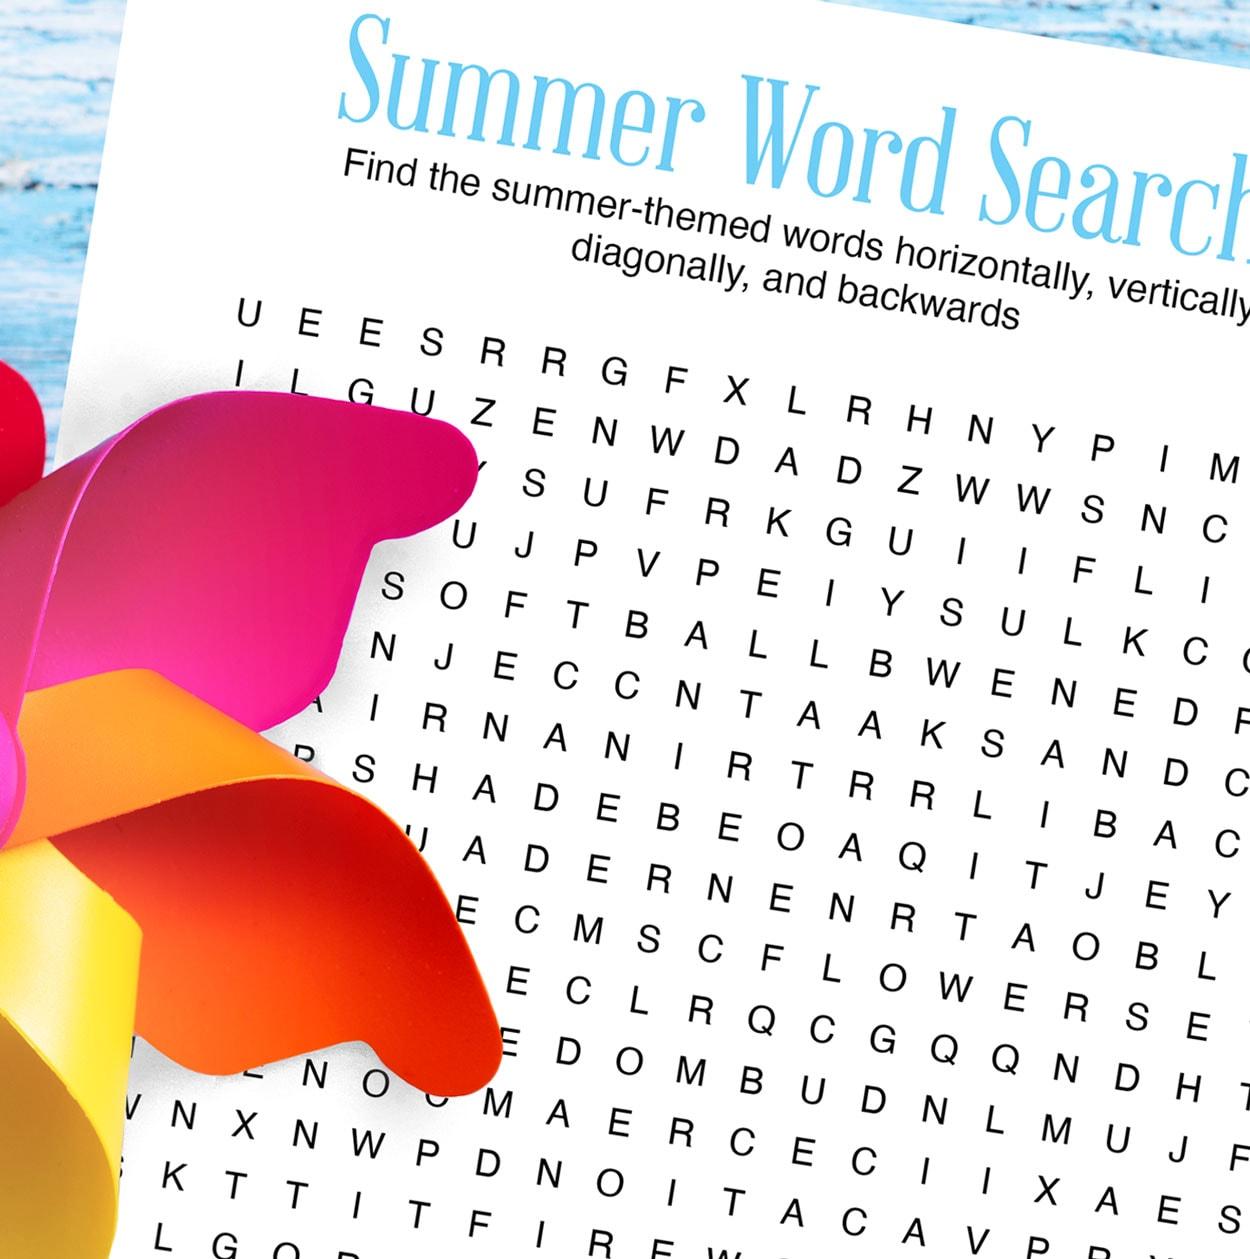 Summer Word Search Printable   Carla Schauer Designs